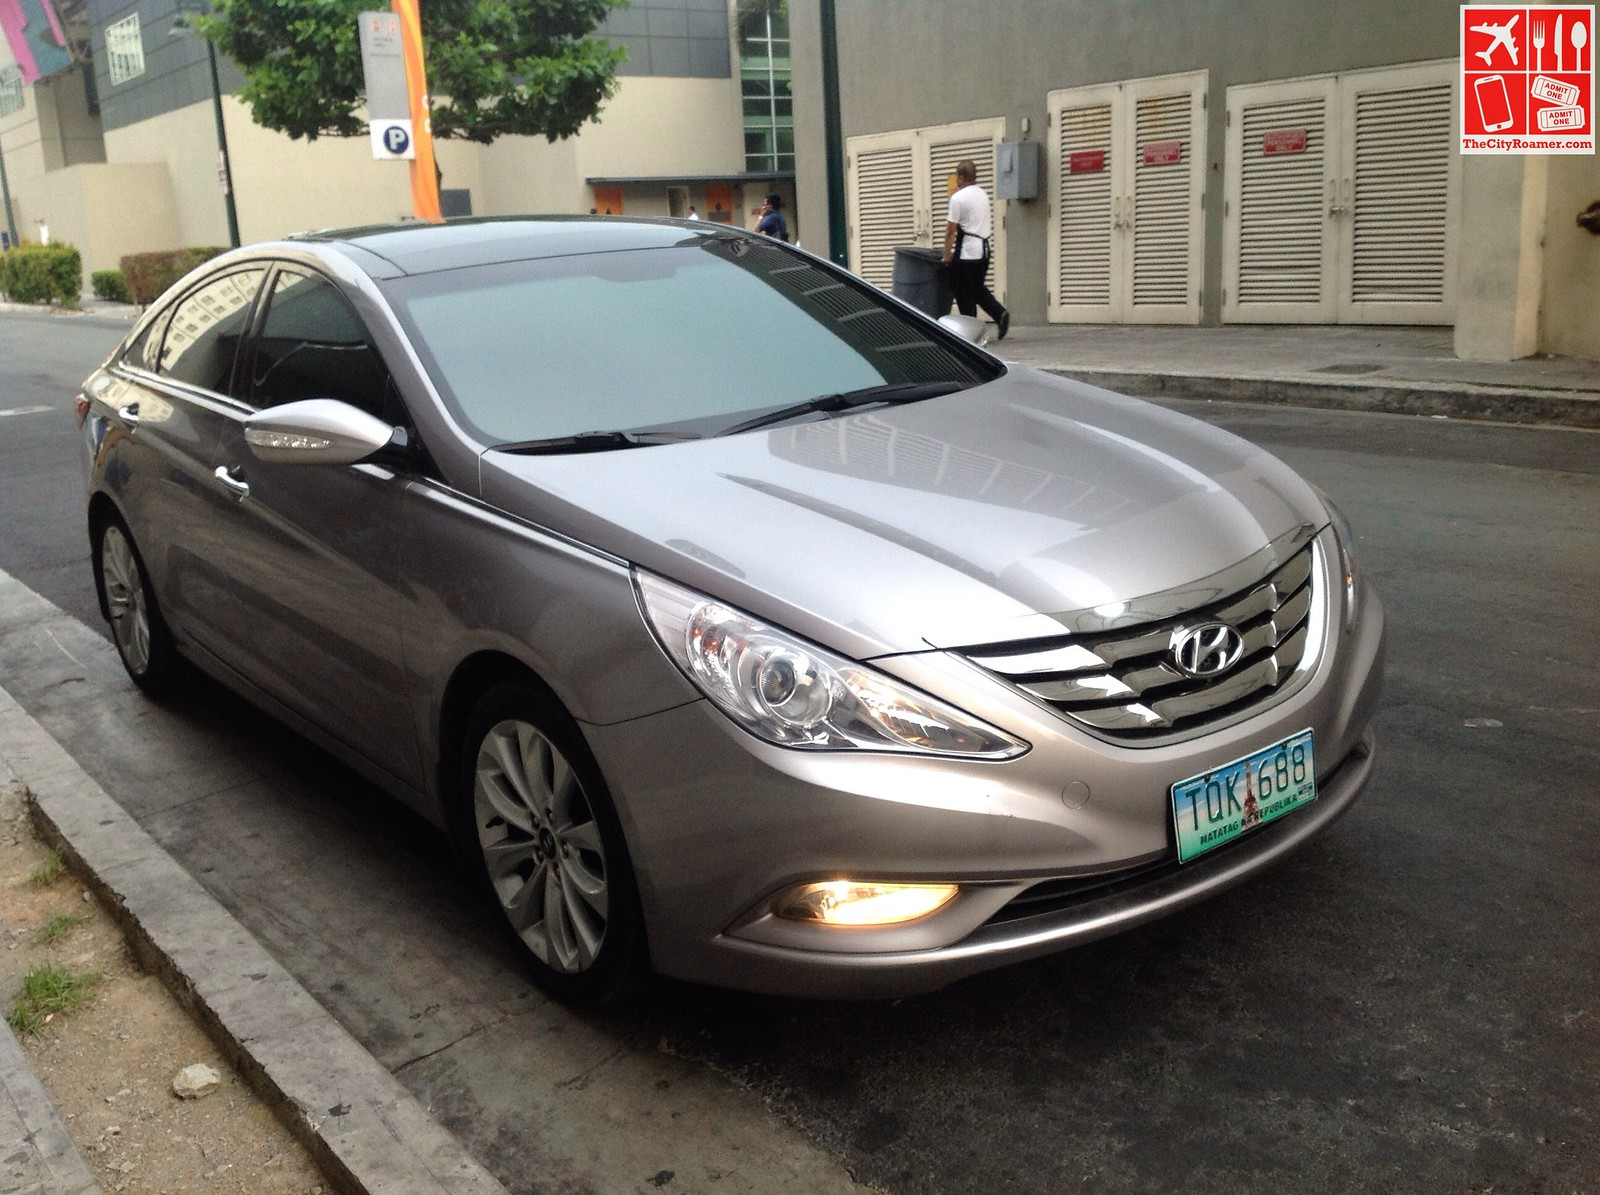 I rode a Hyundai Sonata to the GrabCar Media Launch